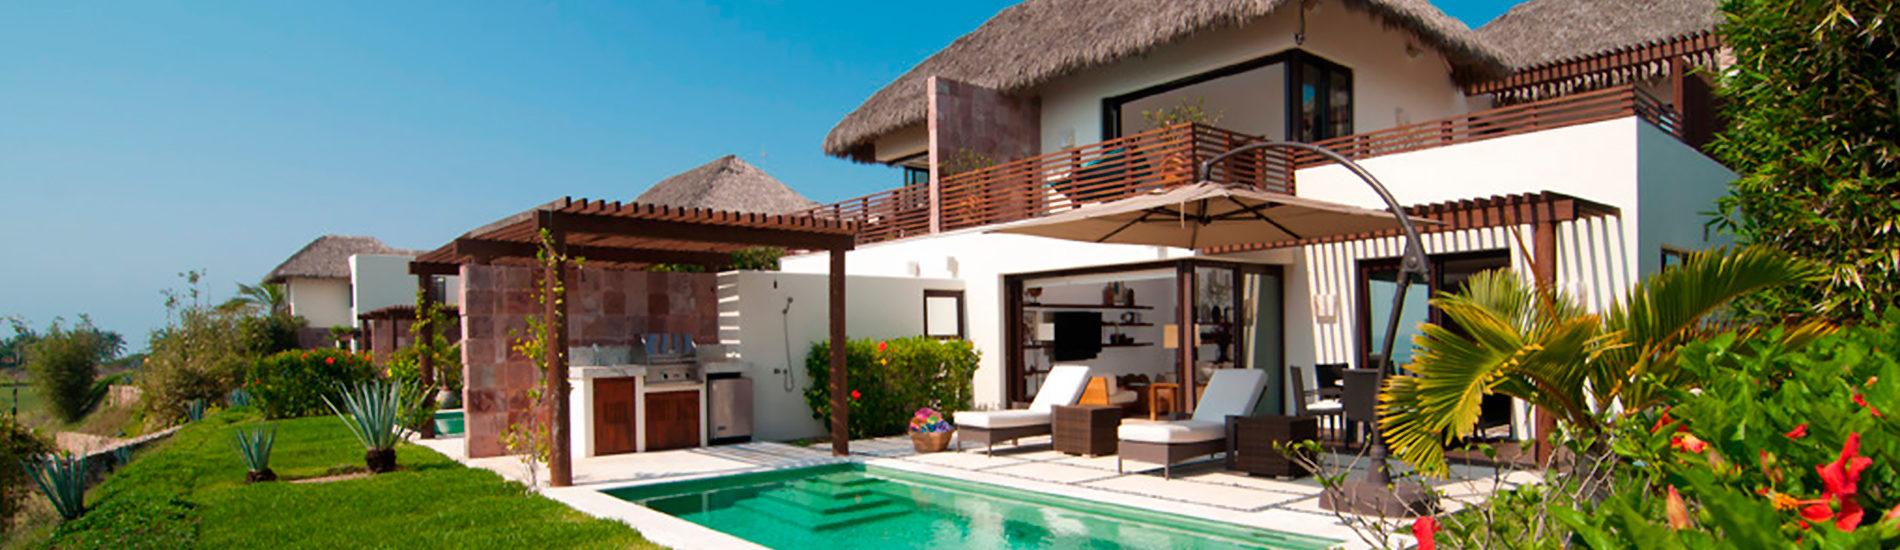 villa aguamarina - punta mita | journey mexico luxury villas